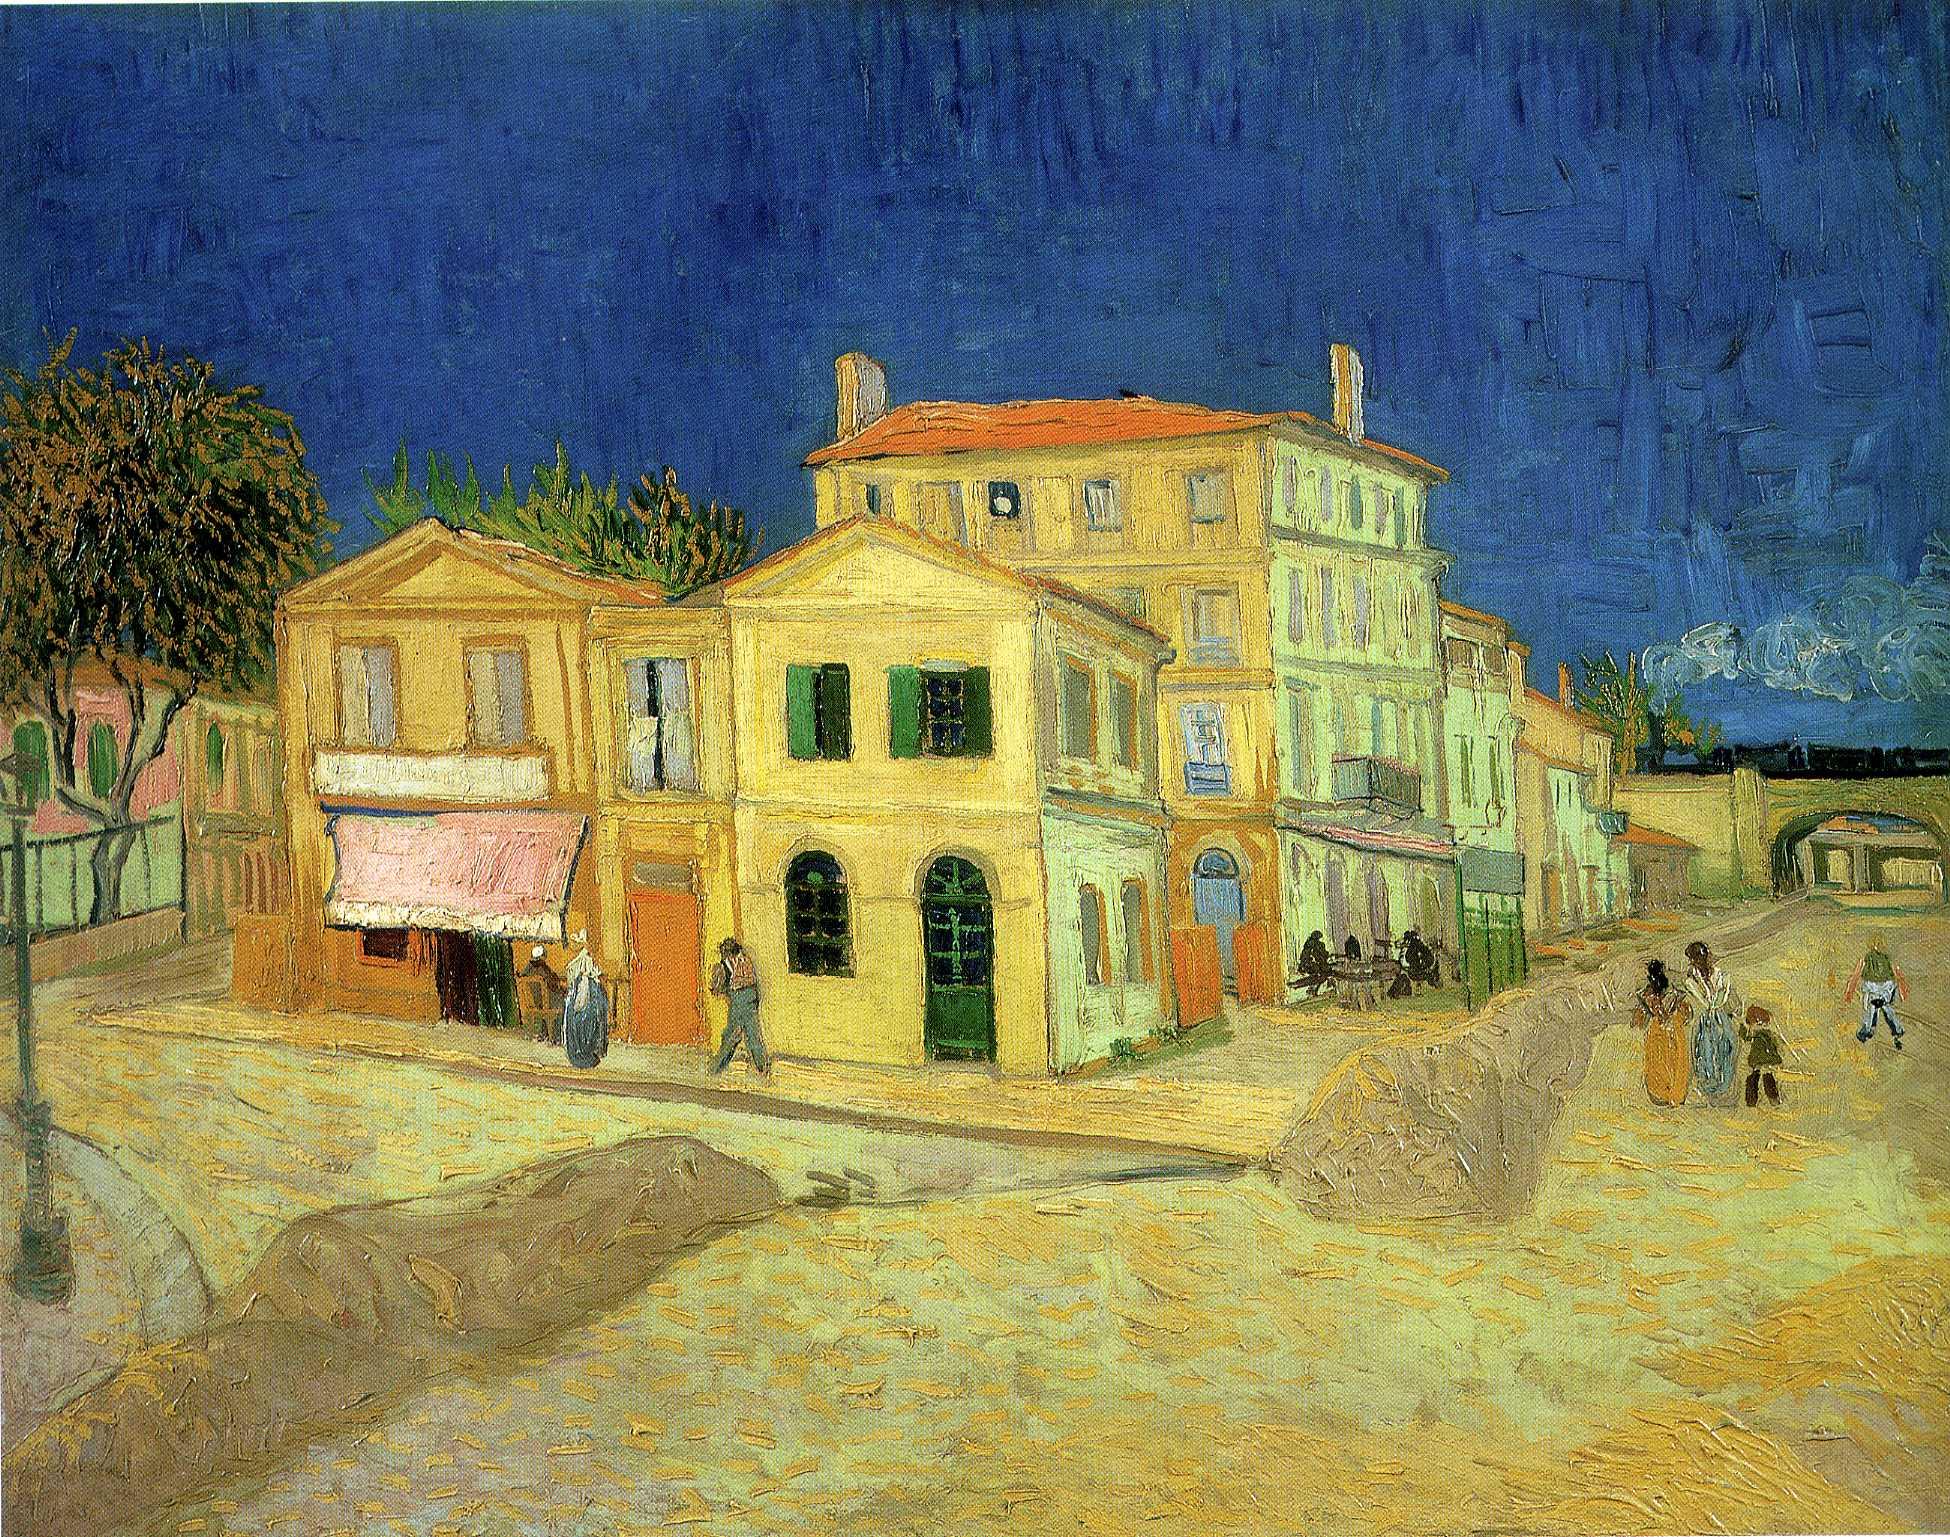 The Yellow Room, Vincent van Gogh 1888